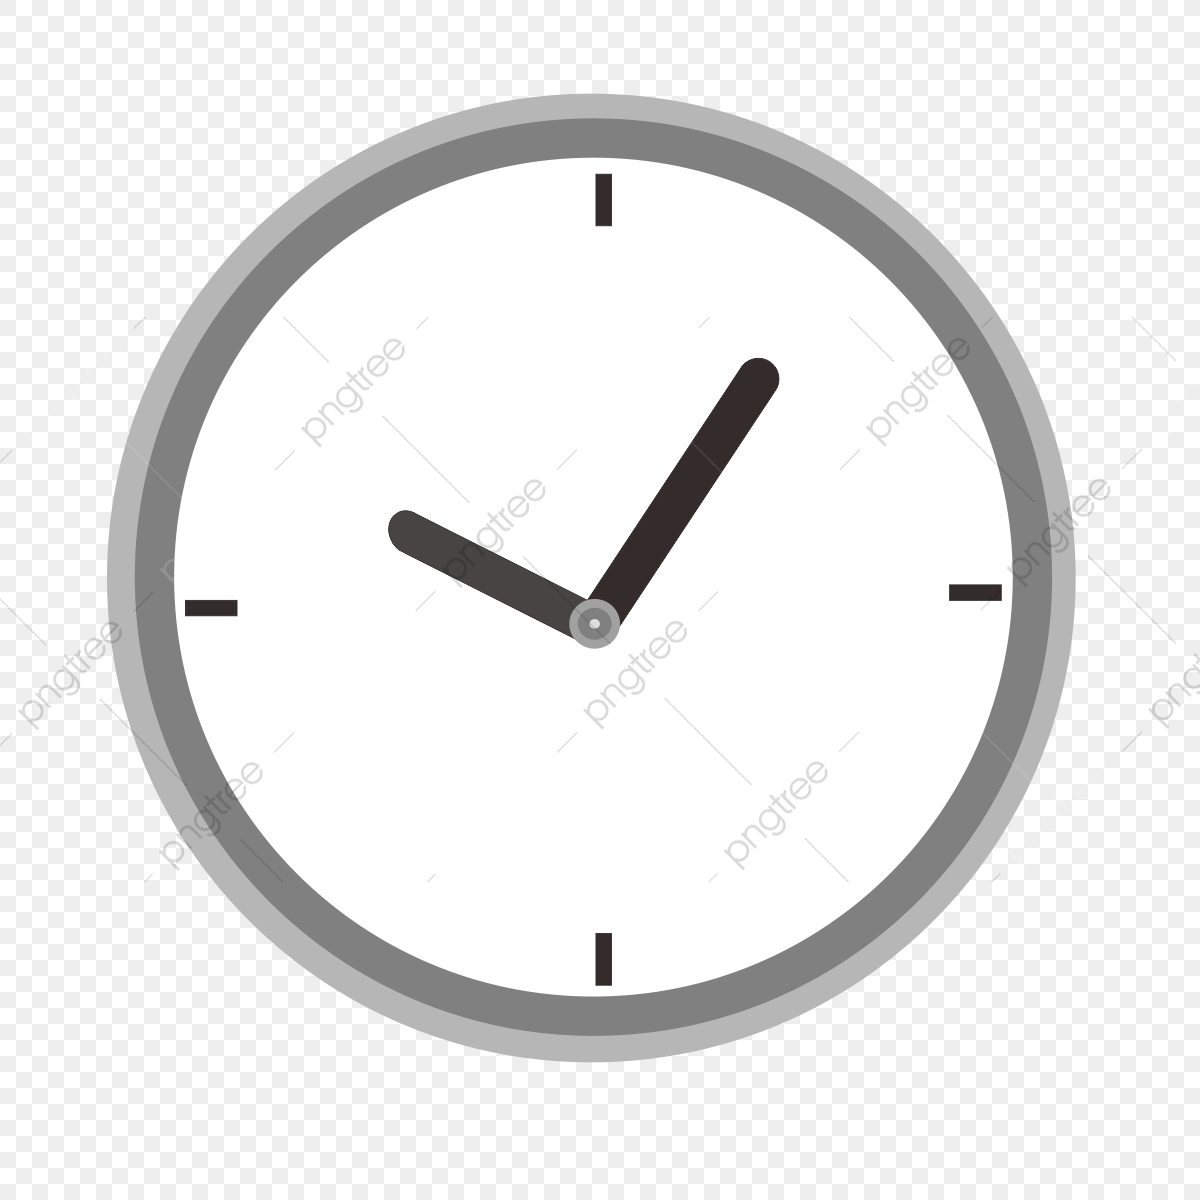 Vector Cartoon Relógio, Png, Relógio, Relógio Dos Desenhos.